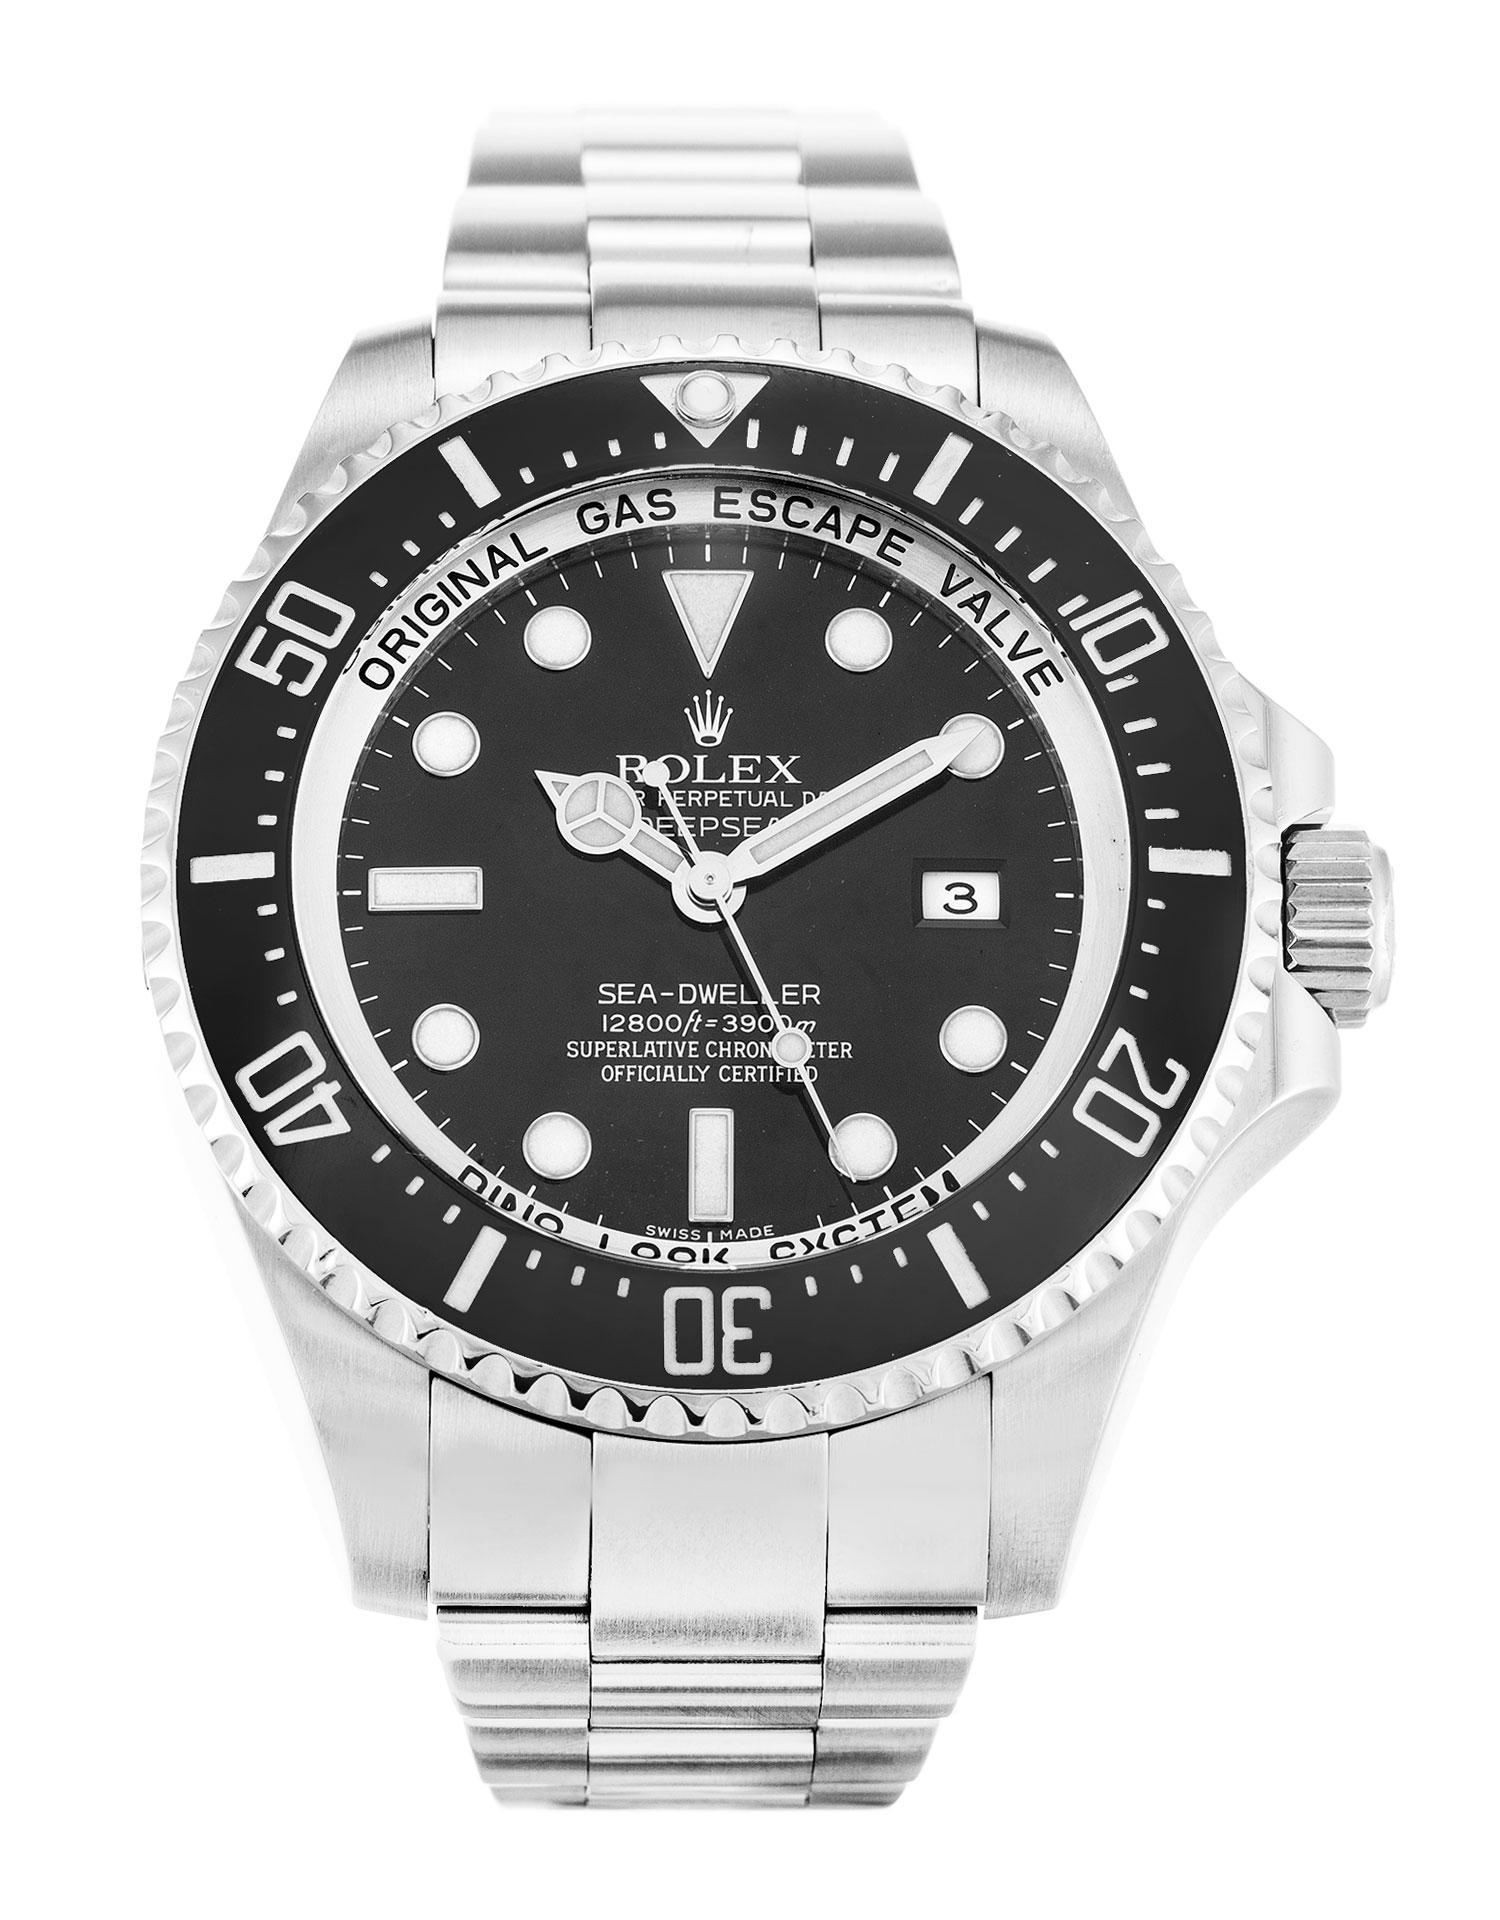 Rolex Deepsea 116660 Mens 44 Mm Steel Case Automatic Movement – iapac.to